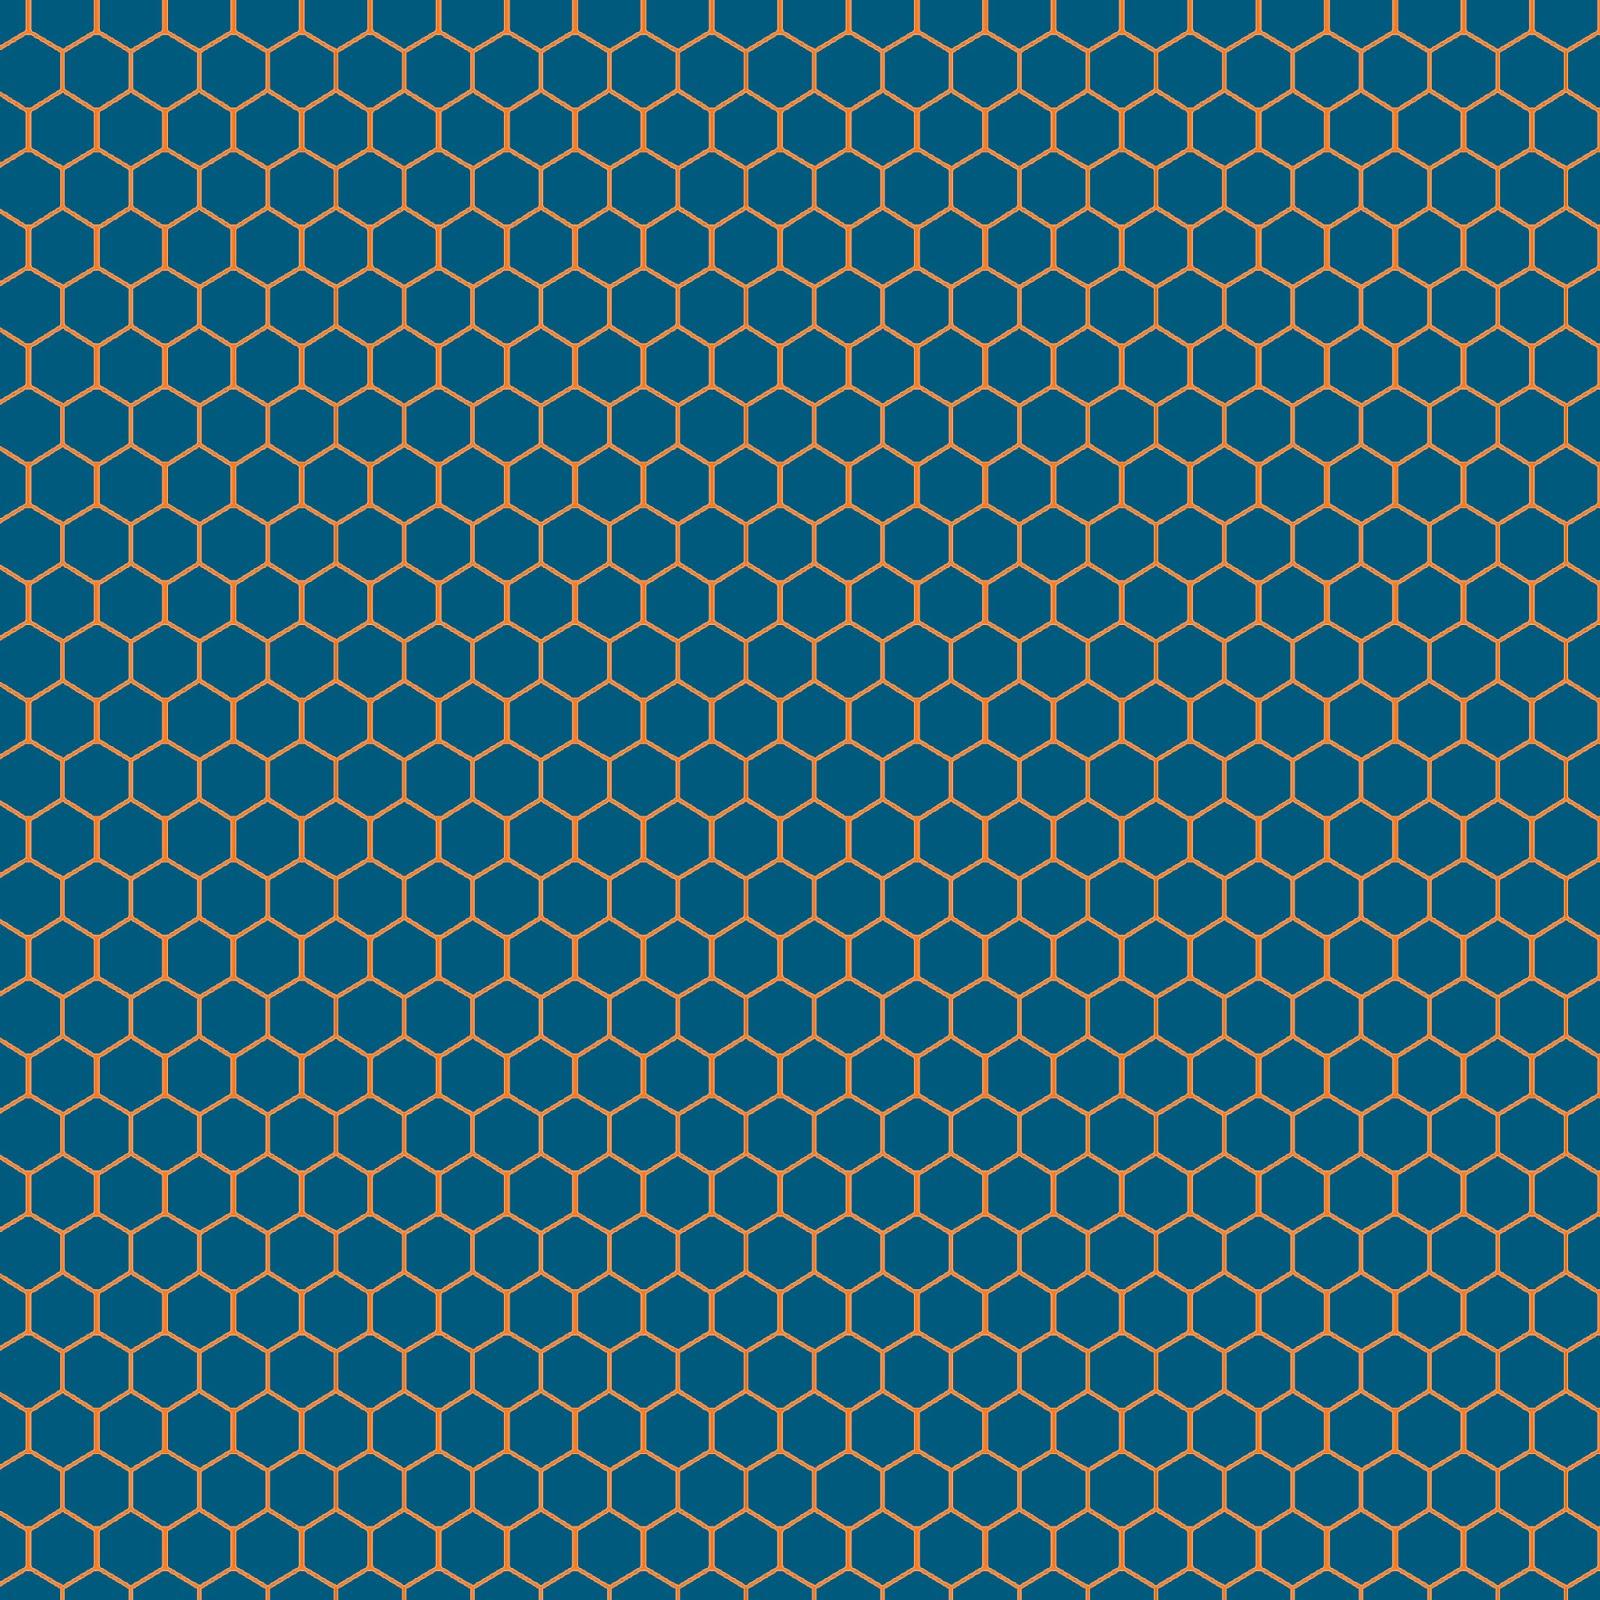 Coral And Navy Chevron Desktop Background Freebie background pattern 1600x1600